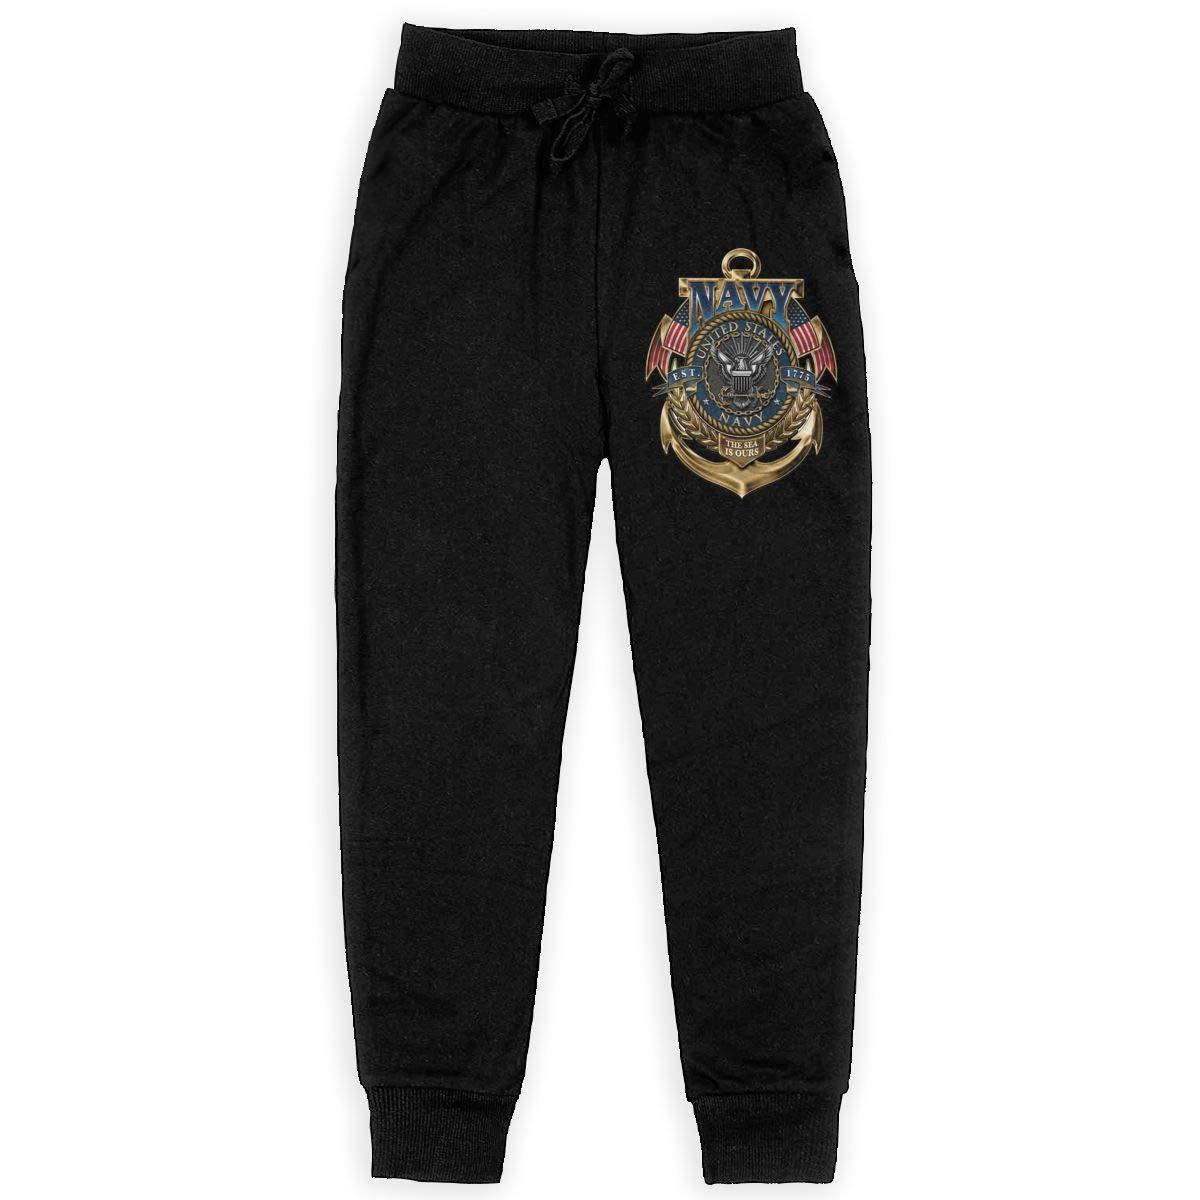 United States Navy The Sea is Ours Version Boys Sweatpants Youth Fleece Pants Boys Fleece Pants Black